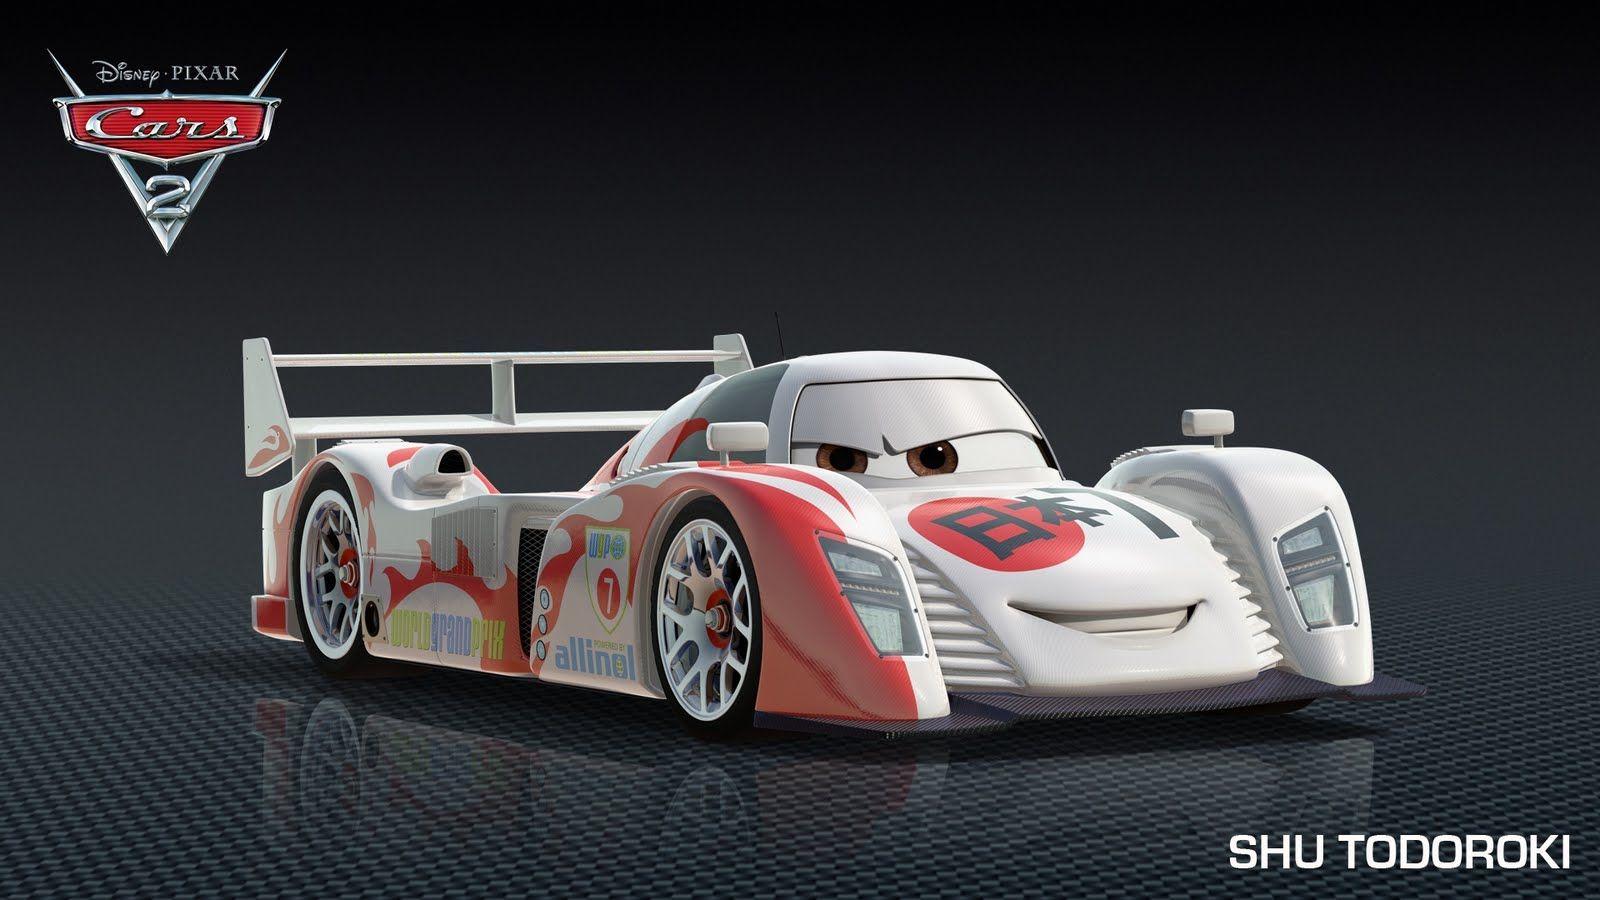 Pixar Cars Ii Characters Google Search Pixar Cars Disney Cars Movie Cars Characters